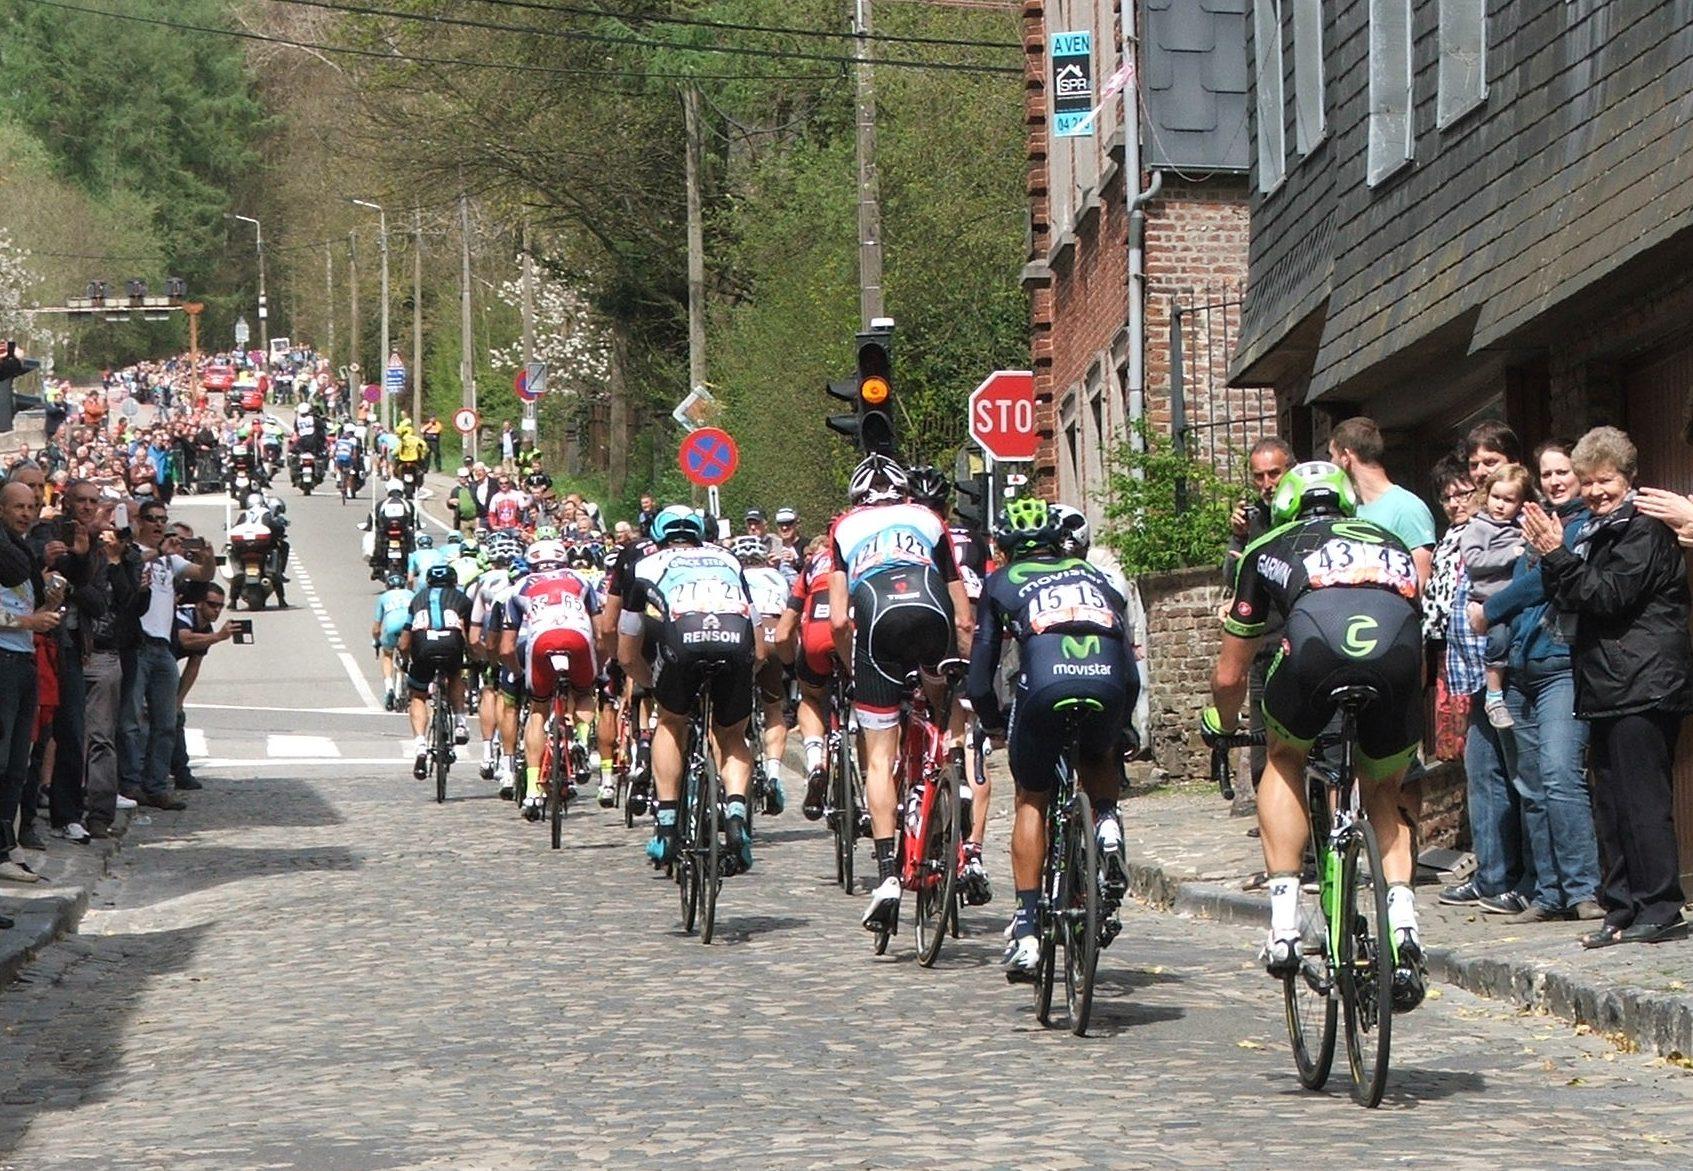 2017 Liège-Bastogne-Liège Route Details | The Bike Comes First on